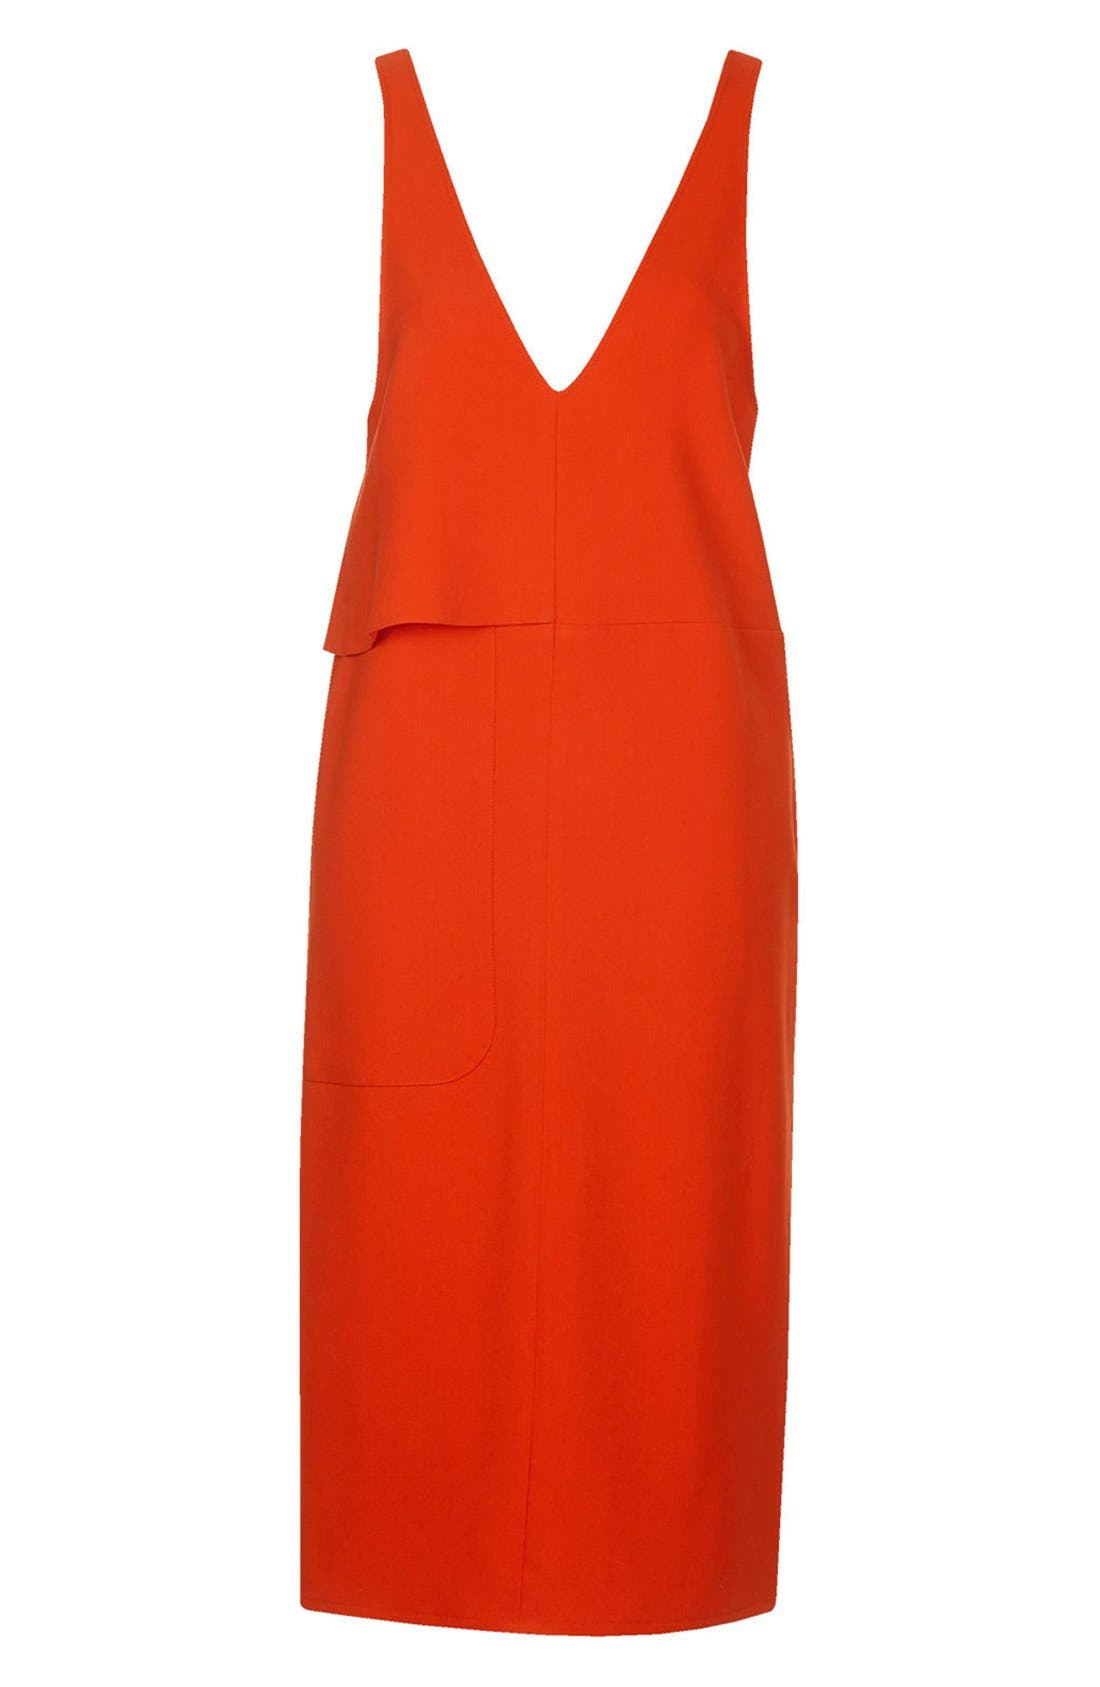 Alternate Image 3  - Topshop Boutique Crepe Layering Dress